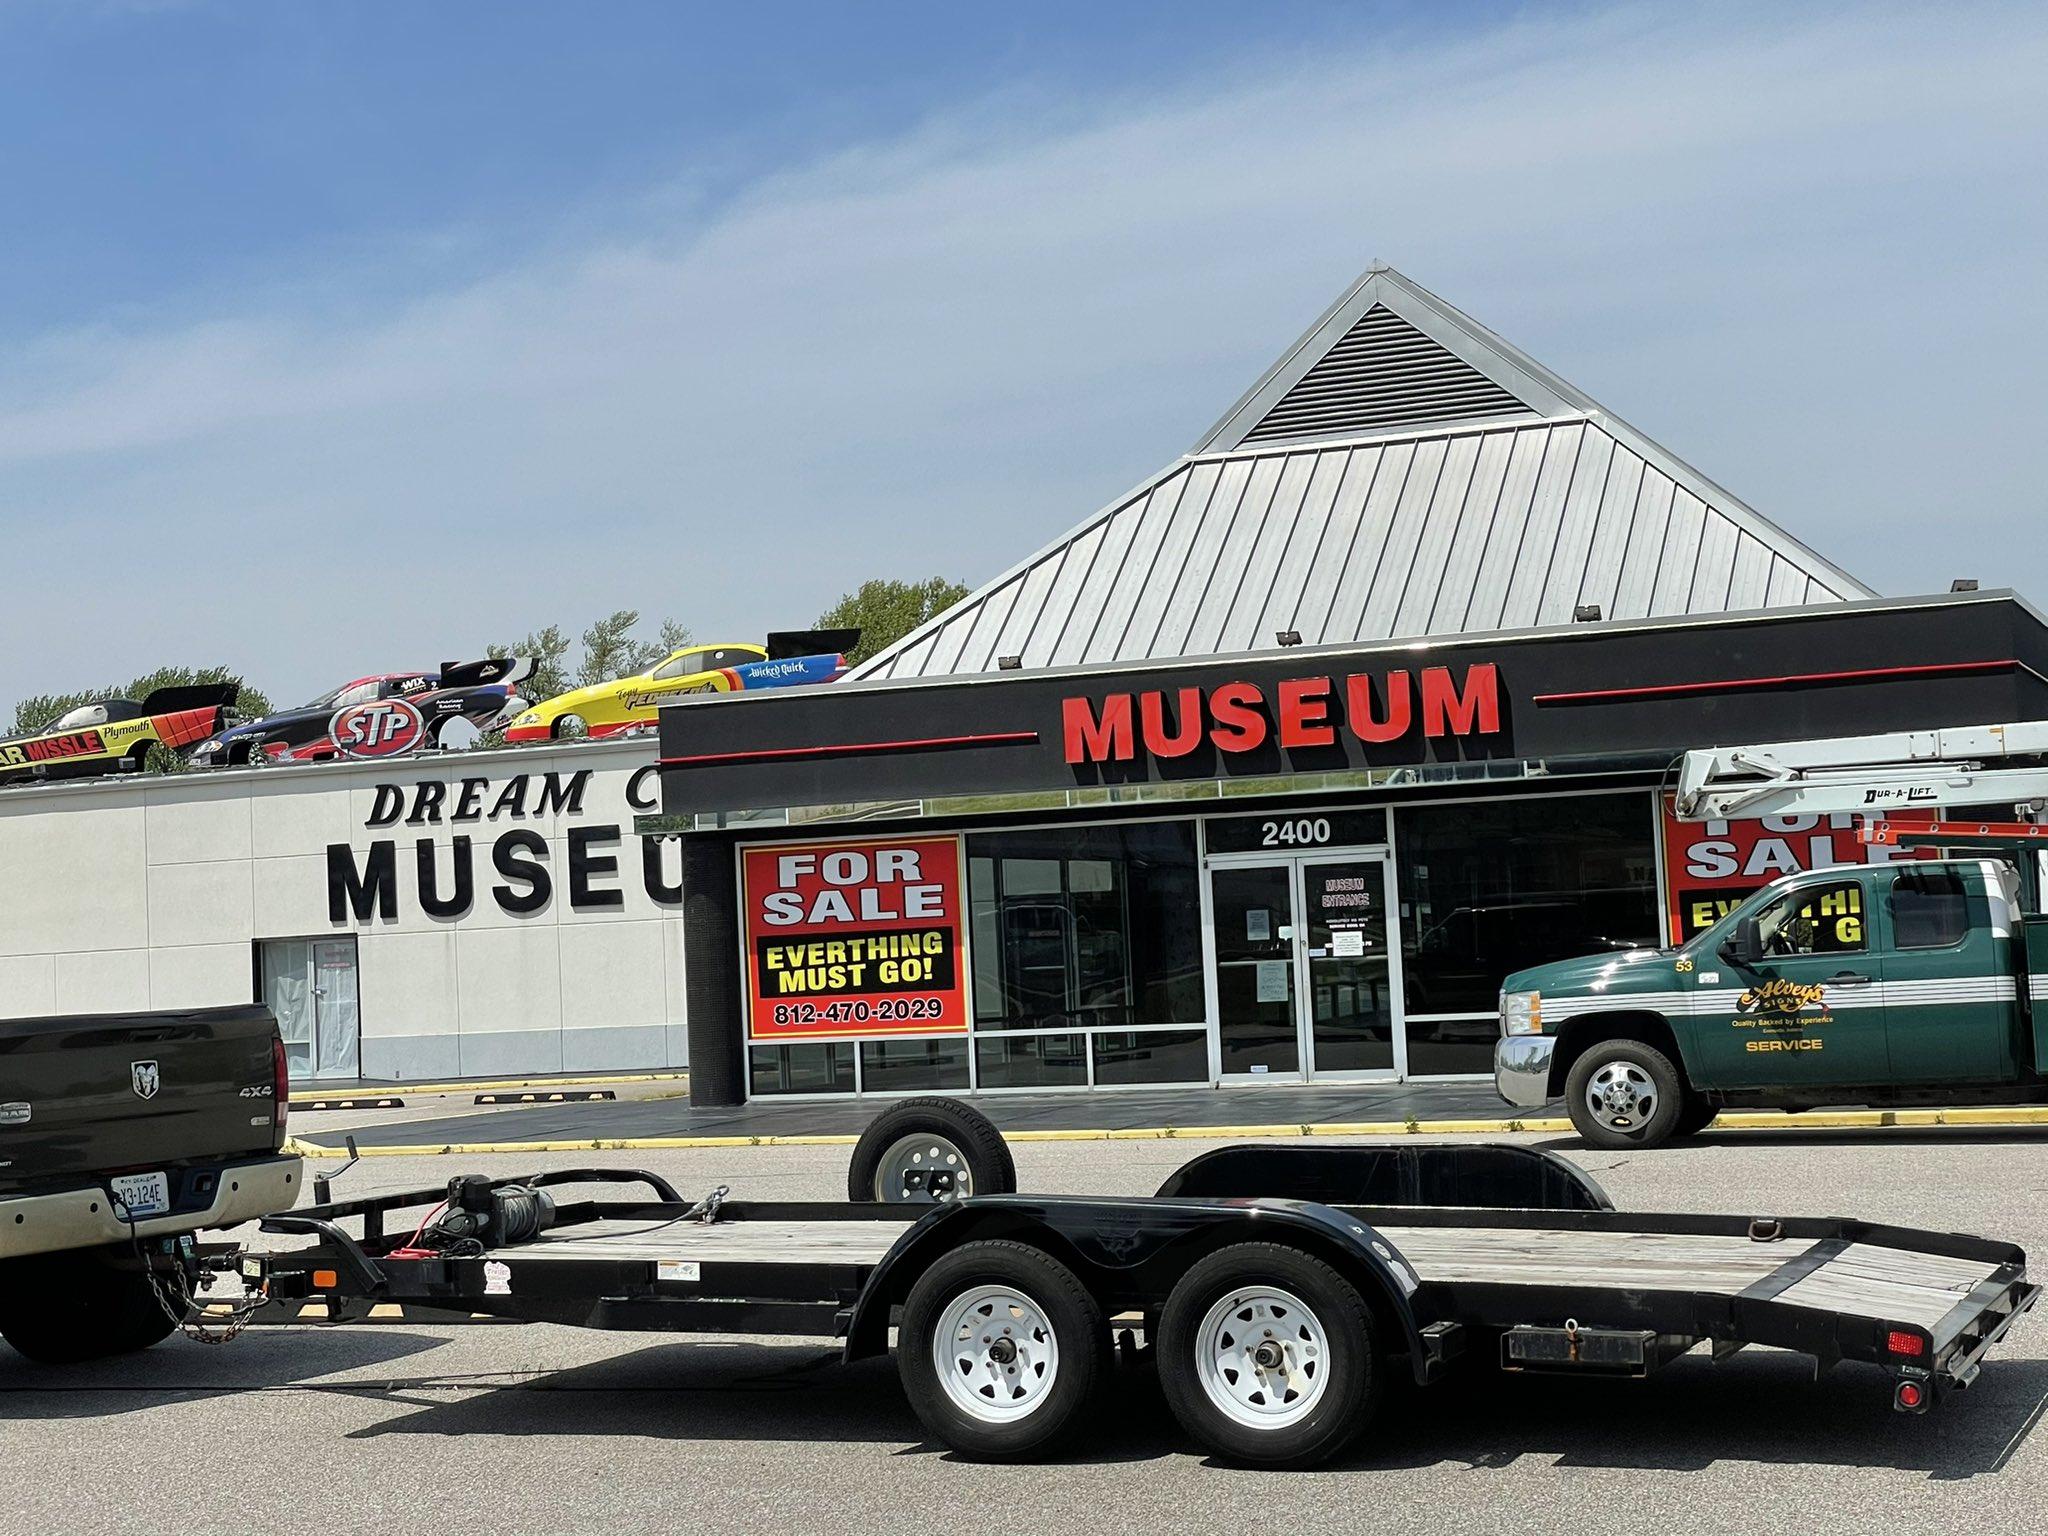 Dream Car Museum corvette comes down